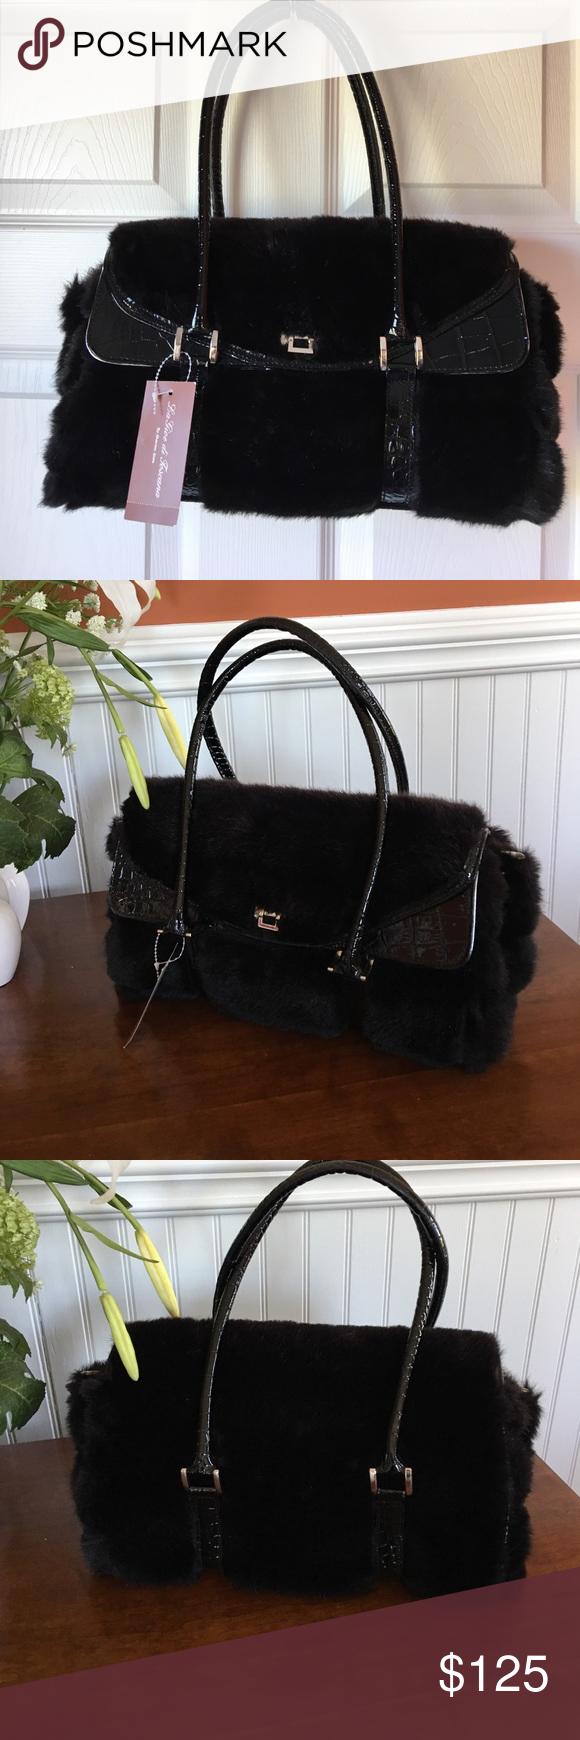 La Gioe Di Toscana Handbag By Sharon Very Pretty Brand Nwt Black Faux Fur With Alligator Print Vinyl Silver